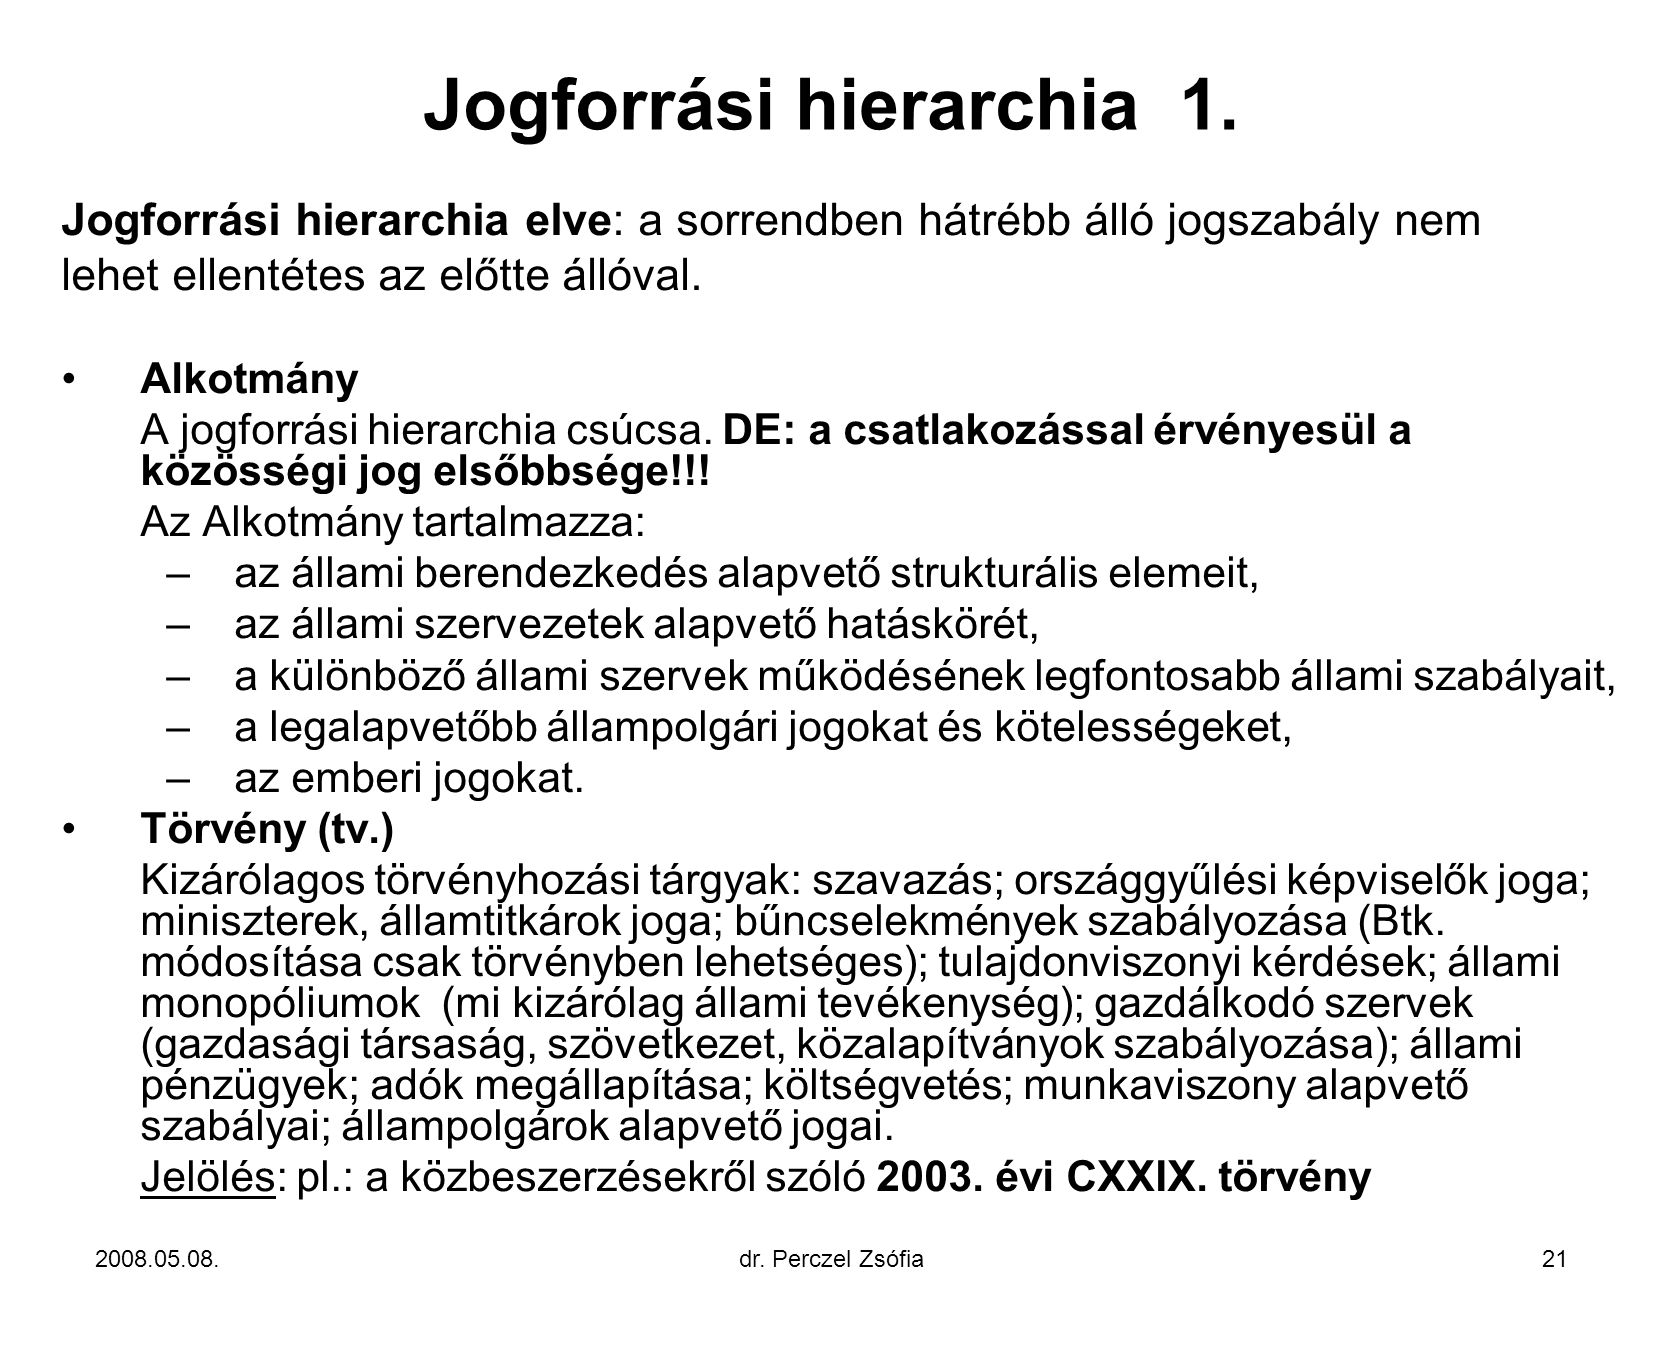 Jogforrási hierarchia 1.